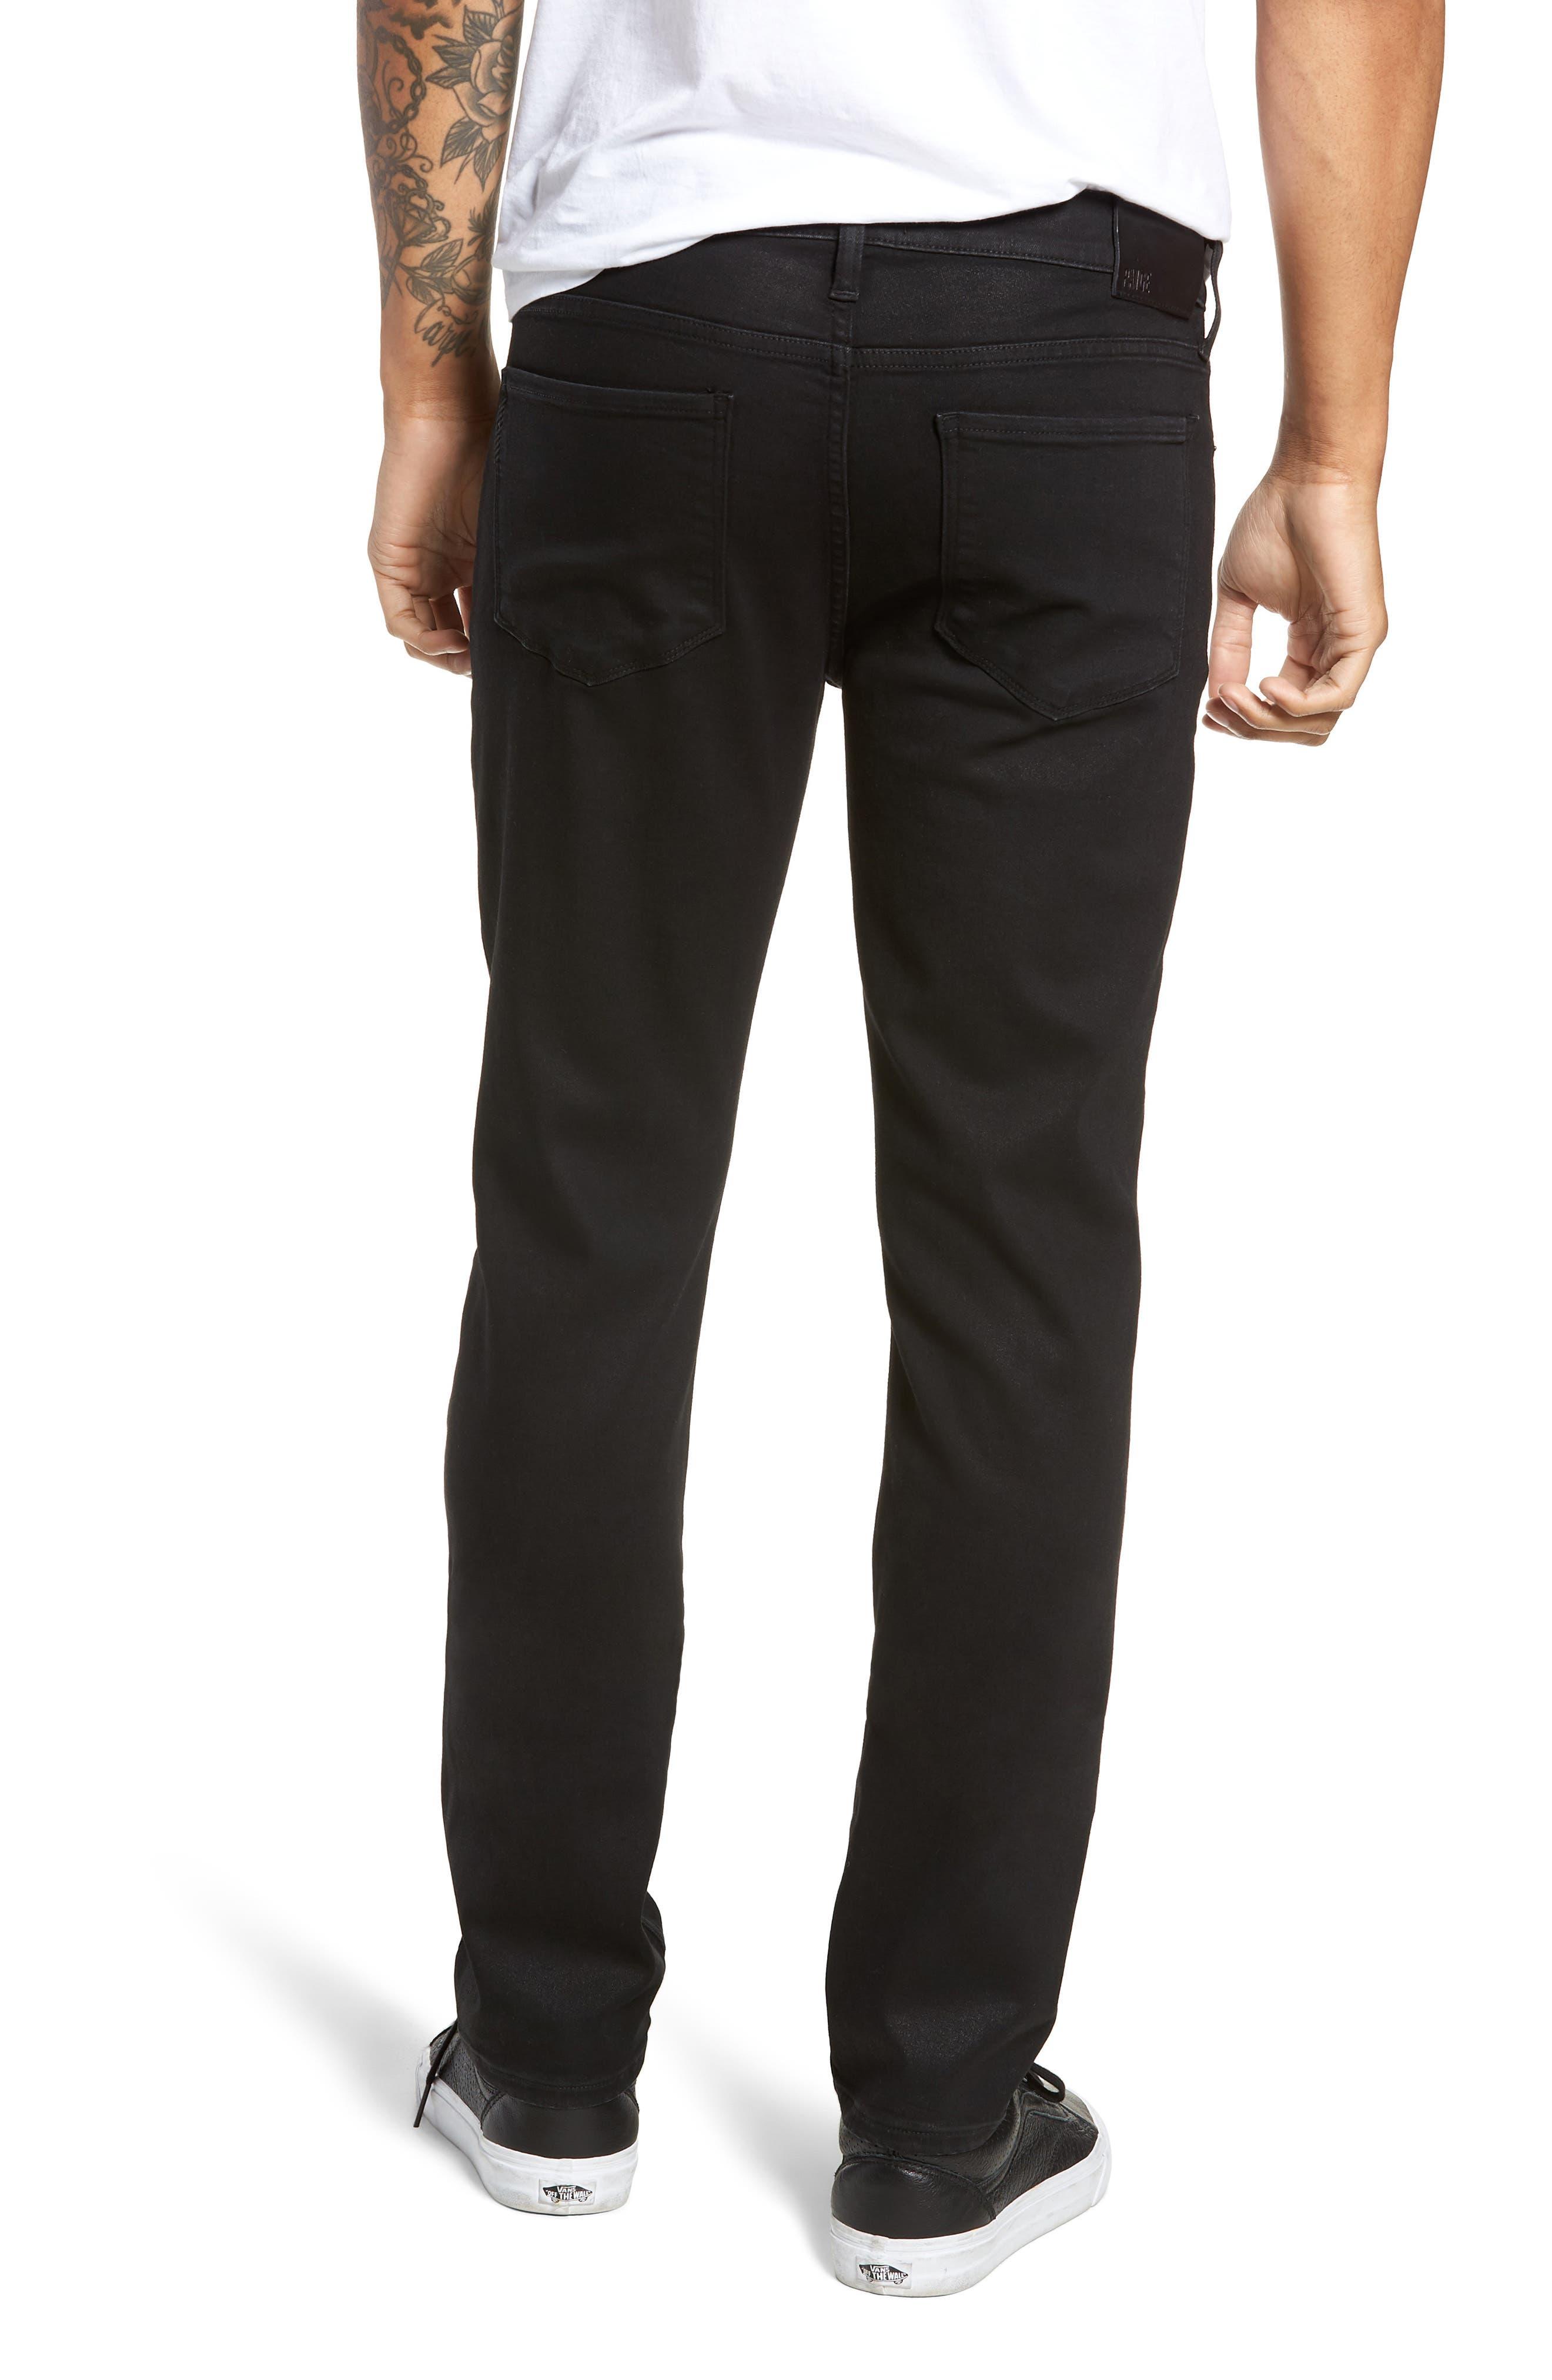 Transcend - Croft Skinny Fit Jeans,                             Alternate thumbnail 2, color,                             400